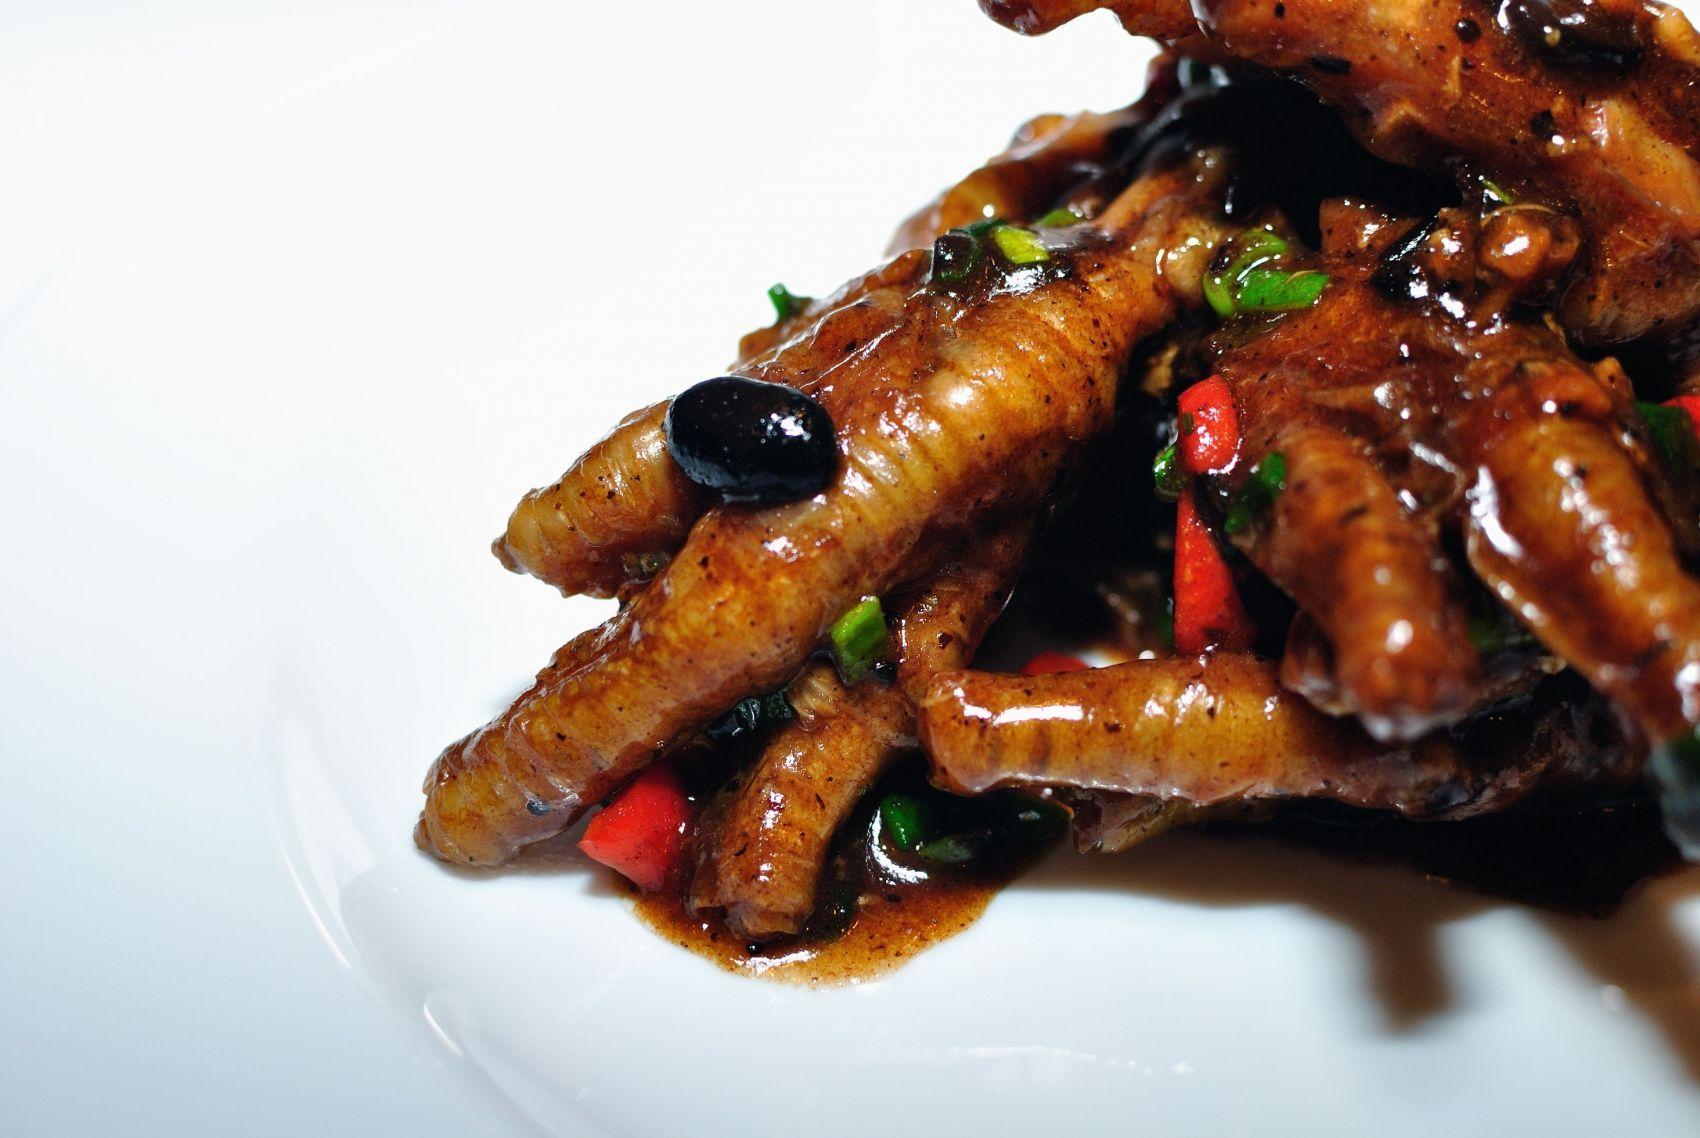 куриные лапки по китайски рецепт с фото пошагово контур-сервис имеет